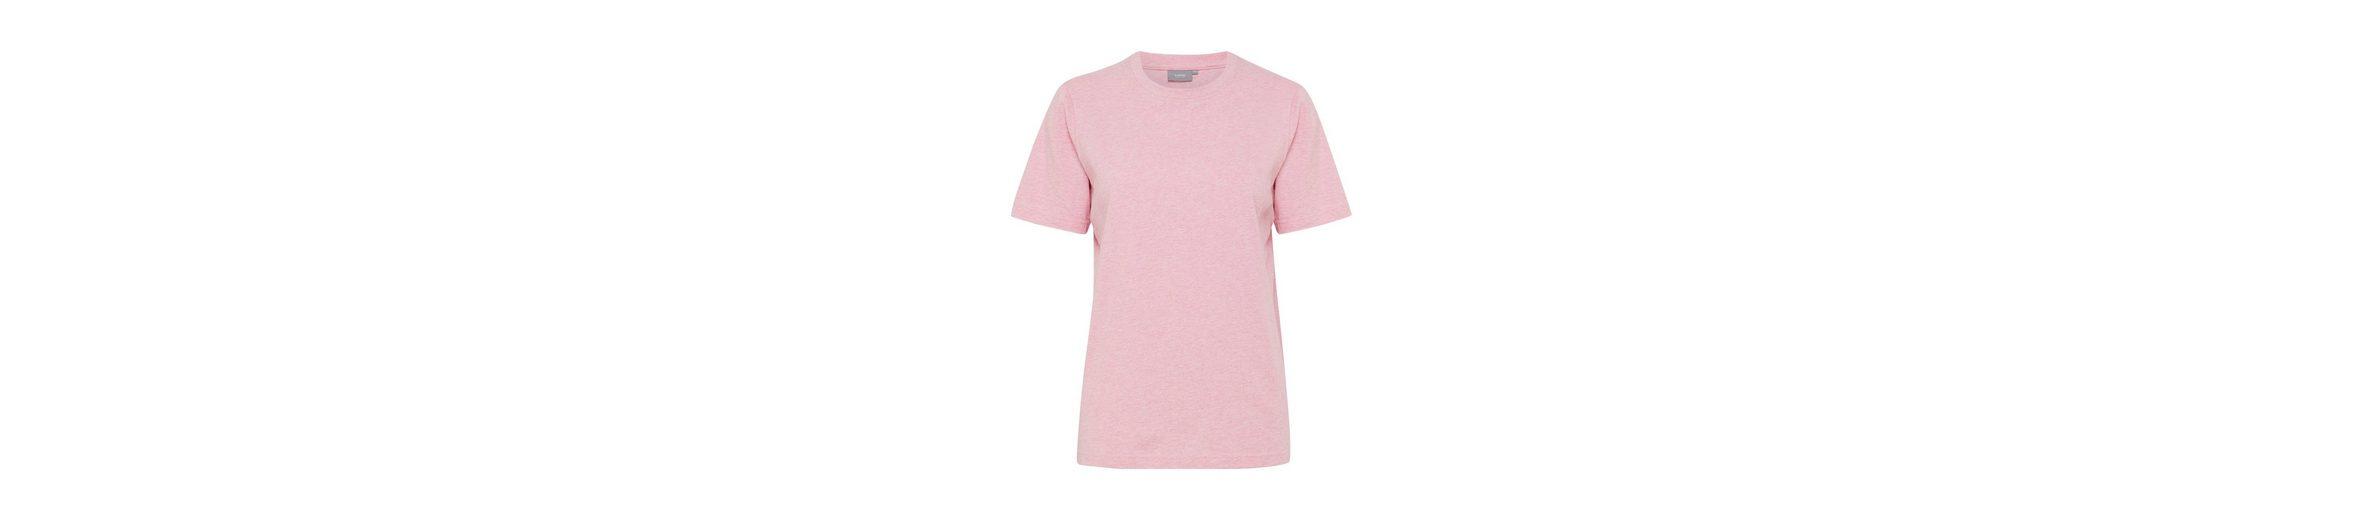 b.young T-Shirt Sherry Spielraum Echt Empfehlen Online 2zdkFcQ